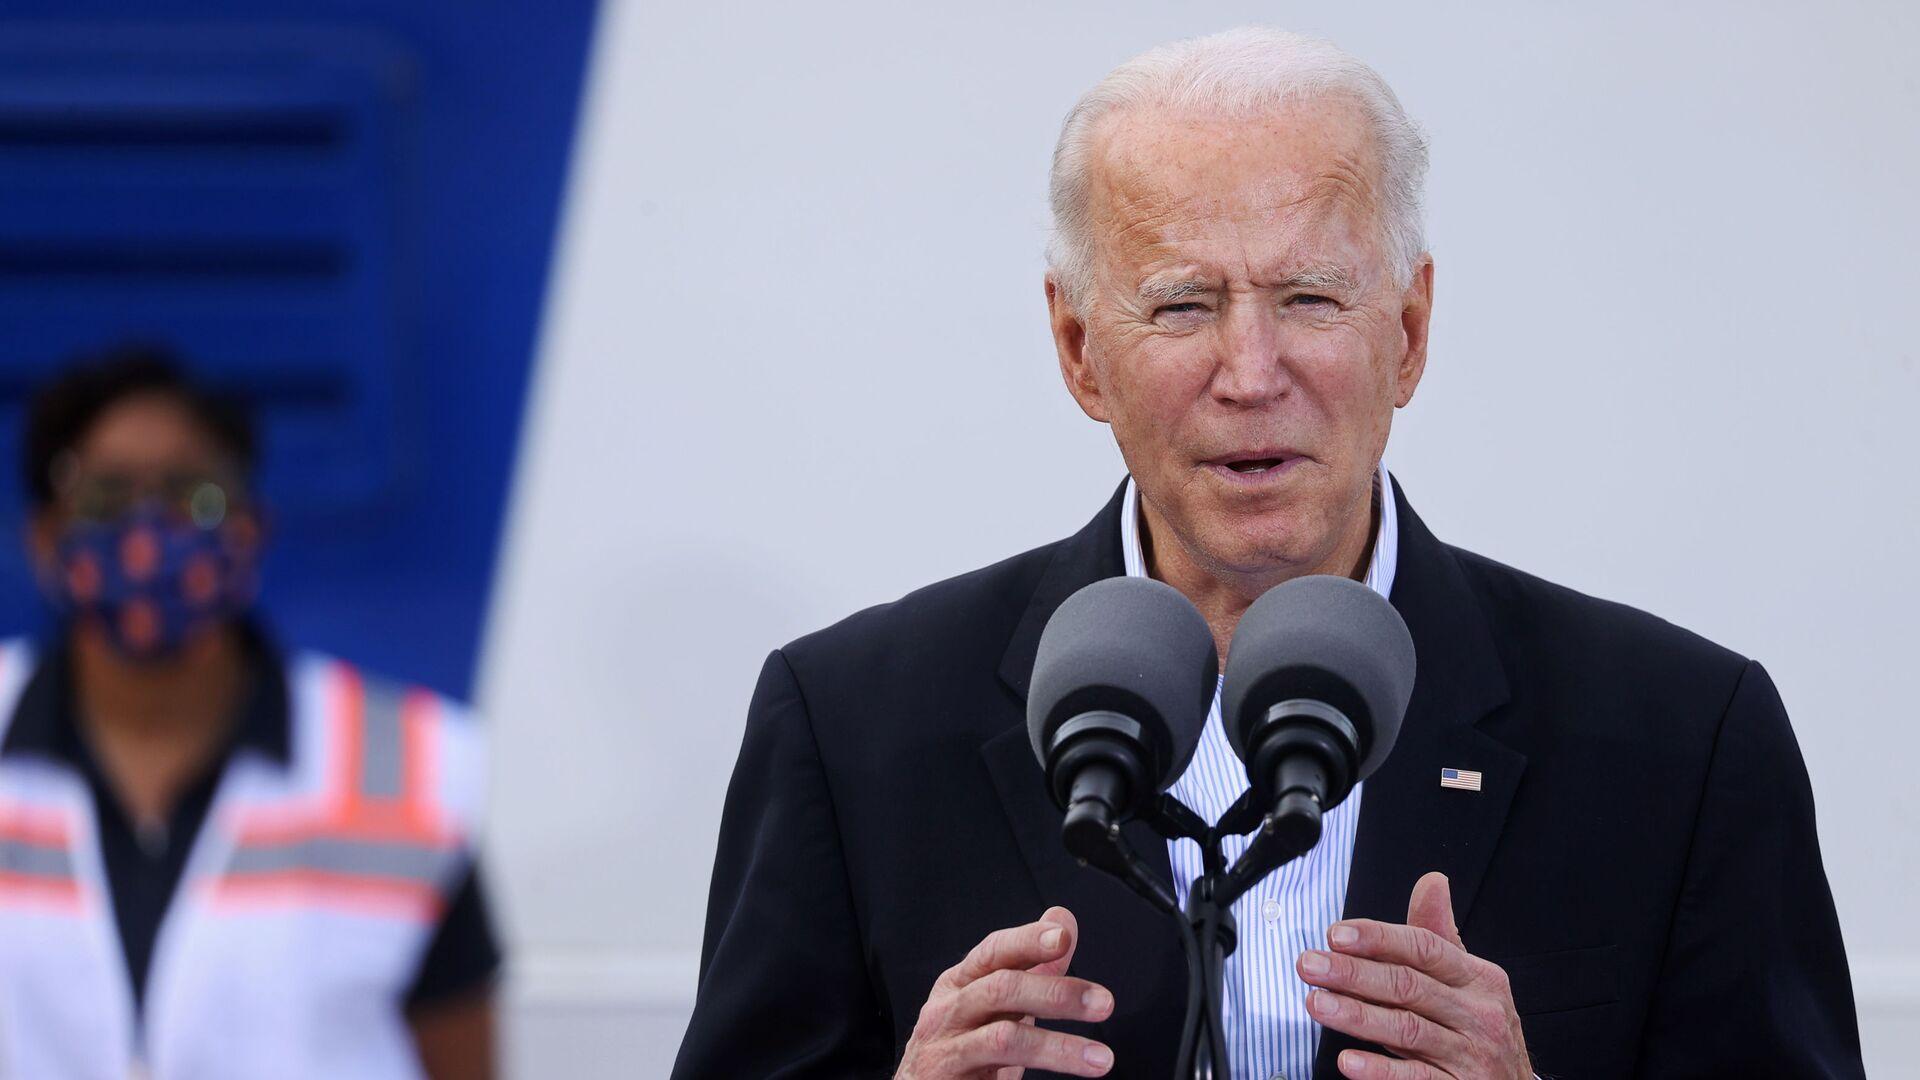 U.S. President Joe Biden speaks after touring a Federal Emergency Management Agency (FEMA) vaccination facility for the coronavirus disease (COVID-19) at NRG Stadium in Houston, Texas, U.S., February 26, 2021 - Sputnik Česká republika, 1920, 10.08.2021